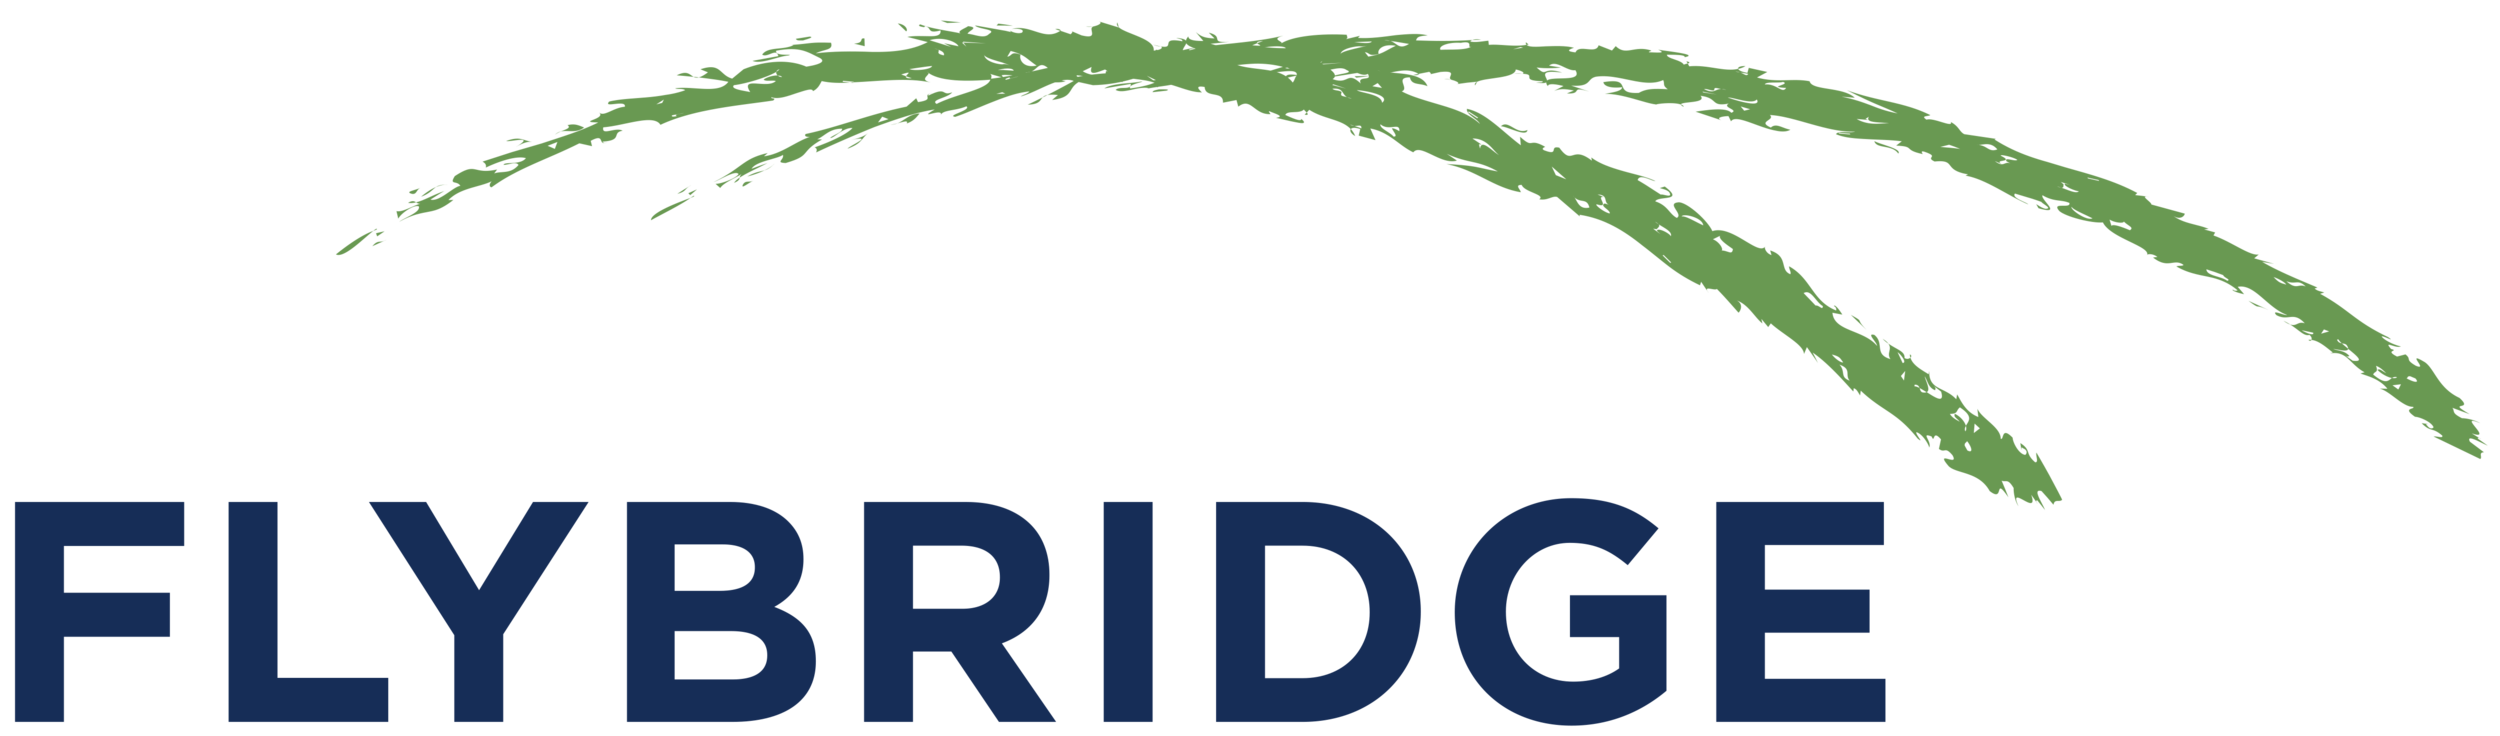 Flybridge logo New.png